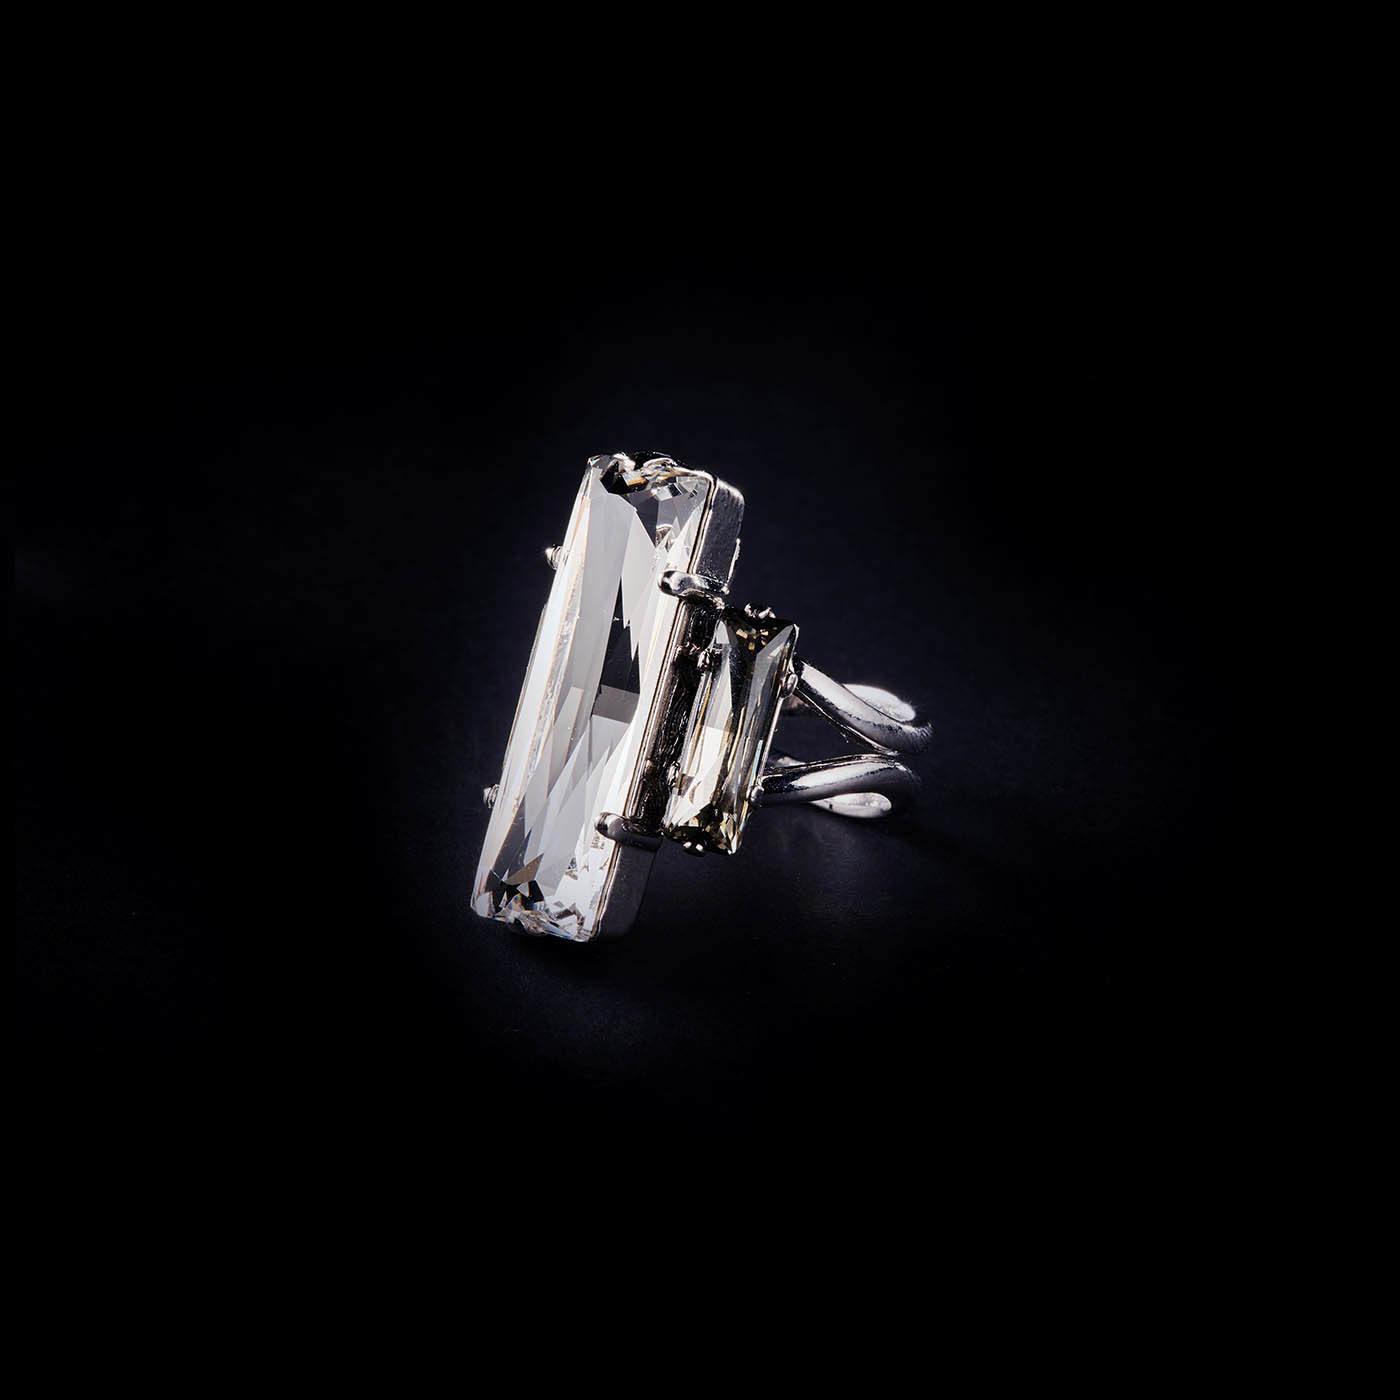 Bjorn van den Berg Fragile Ring Silver Clear Black.Diamond 1